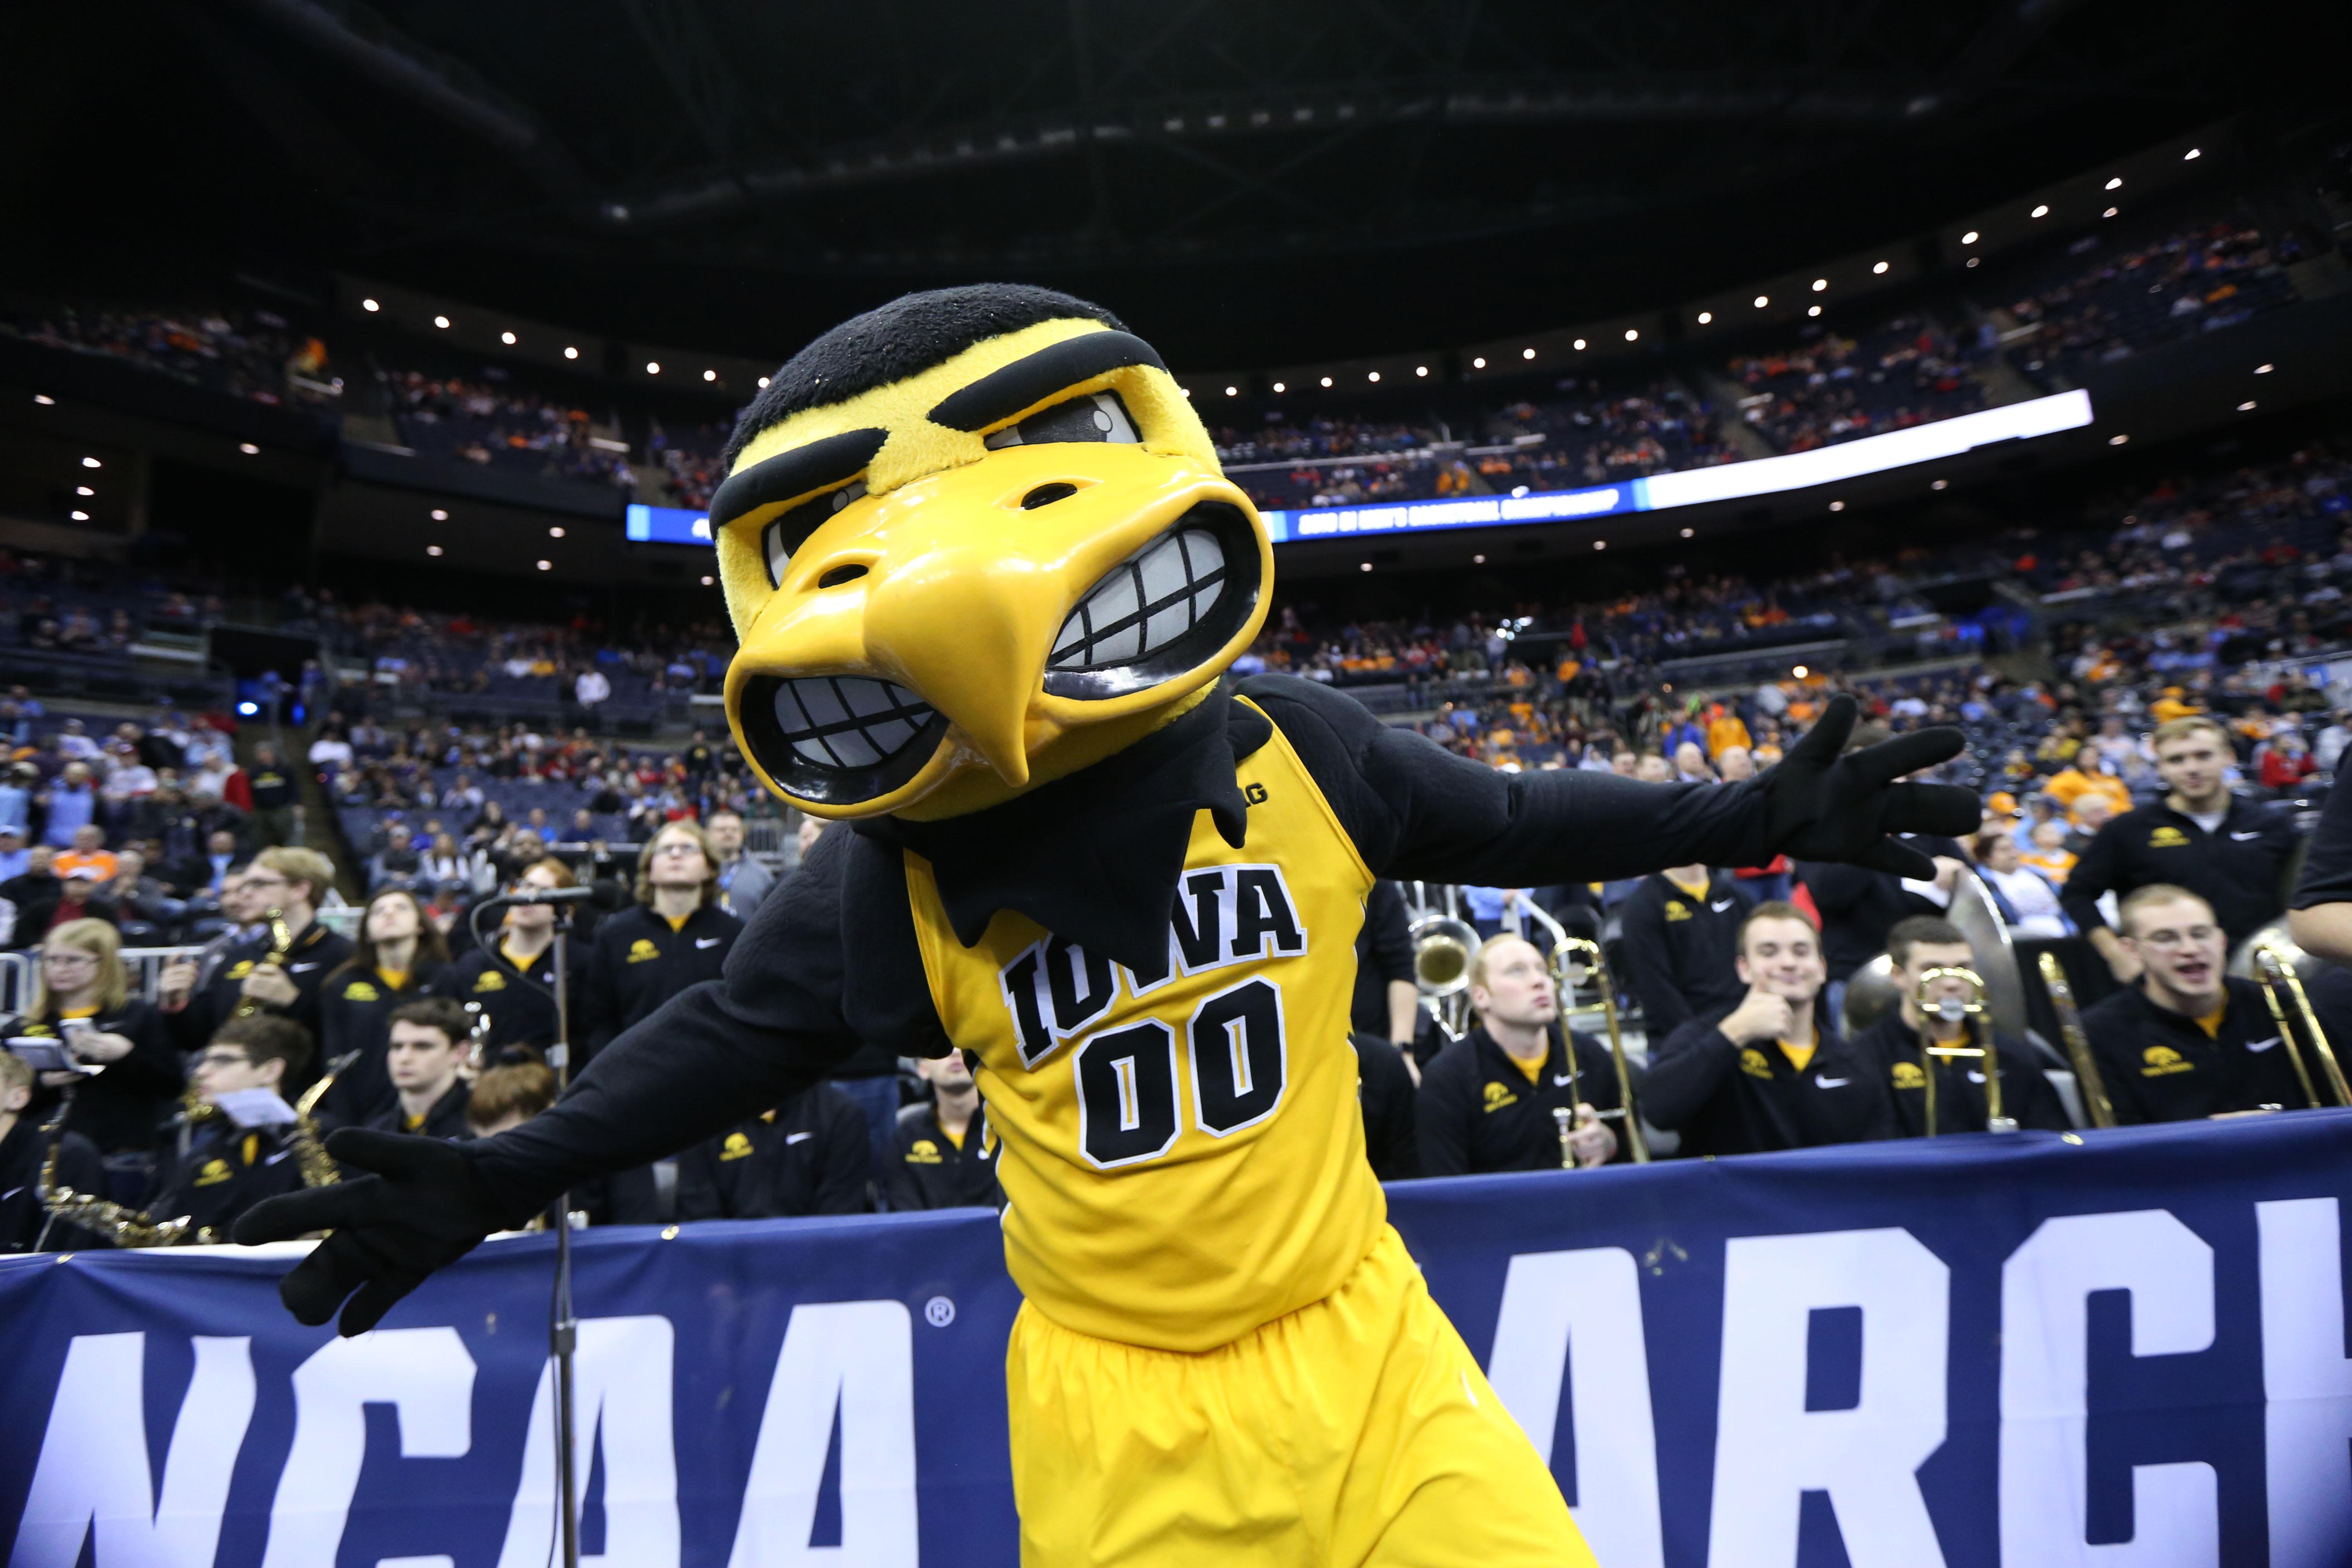 super popular 80050 d5c78 ACC/Big Ten Challenge basketball games announced; Syracuse ...